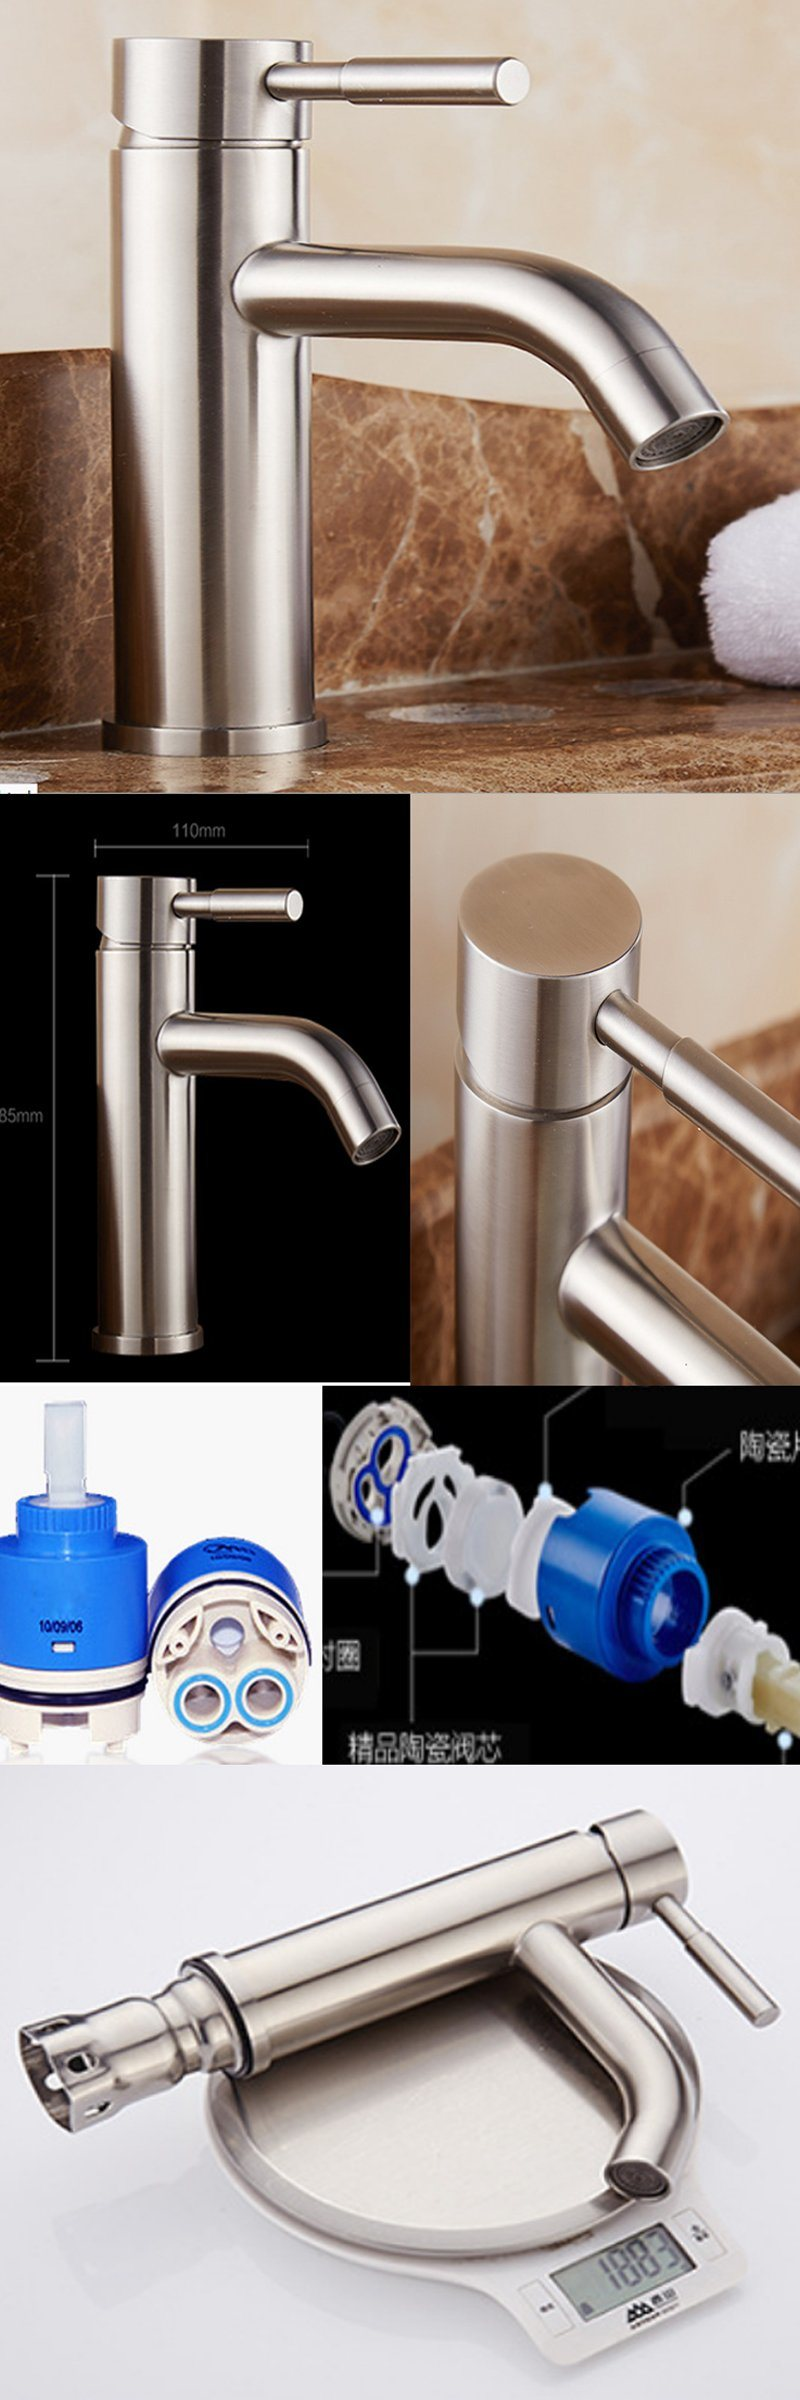 Sanitary Ware Accessories Zinc Bathroom Wash Basin Faucet Bathtub Faucet with Single Handle